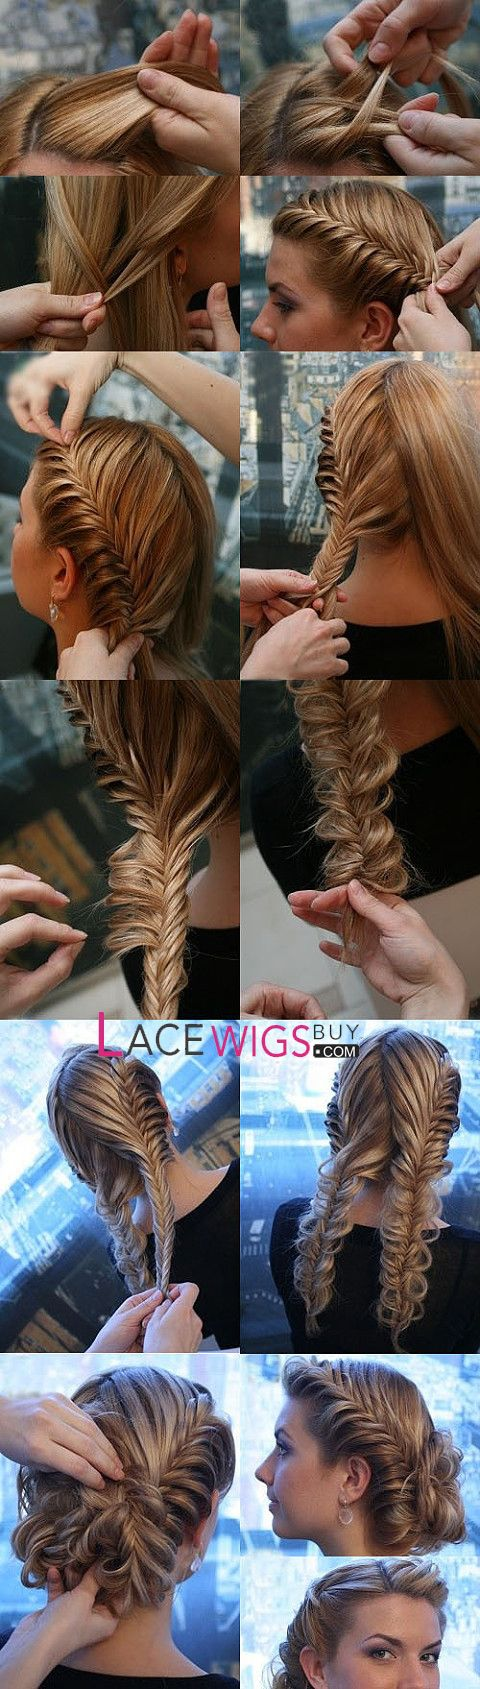 Como hacer peinados con trenzas para novias paso a paso